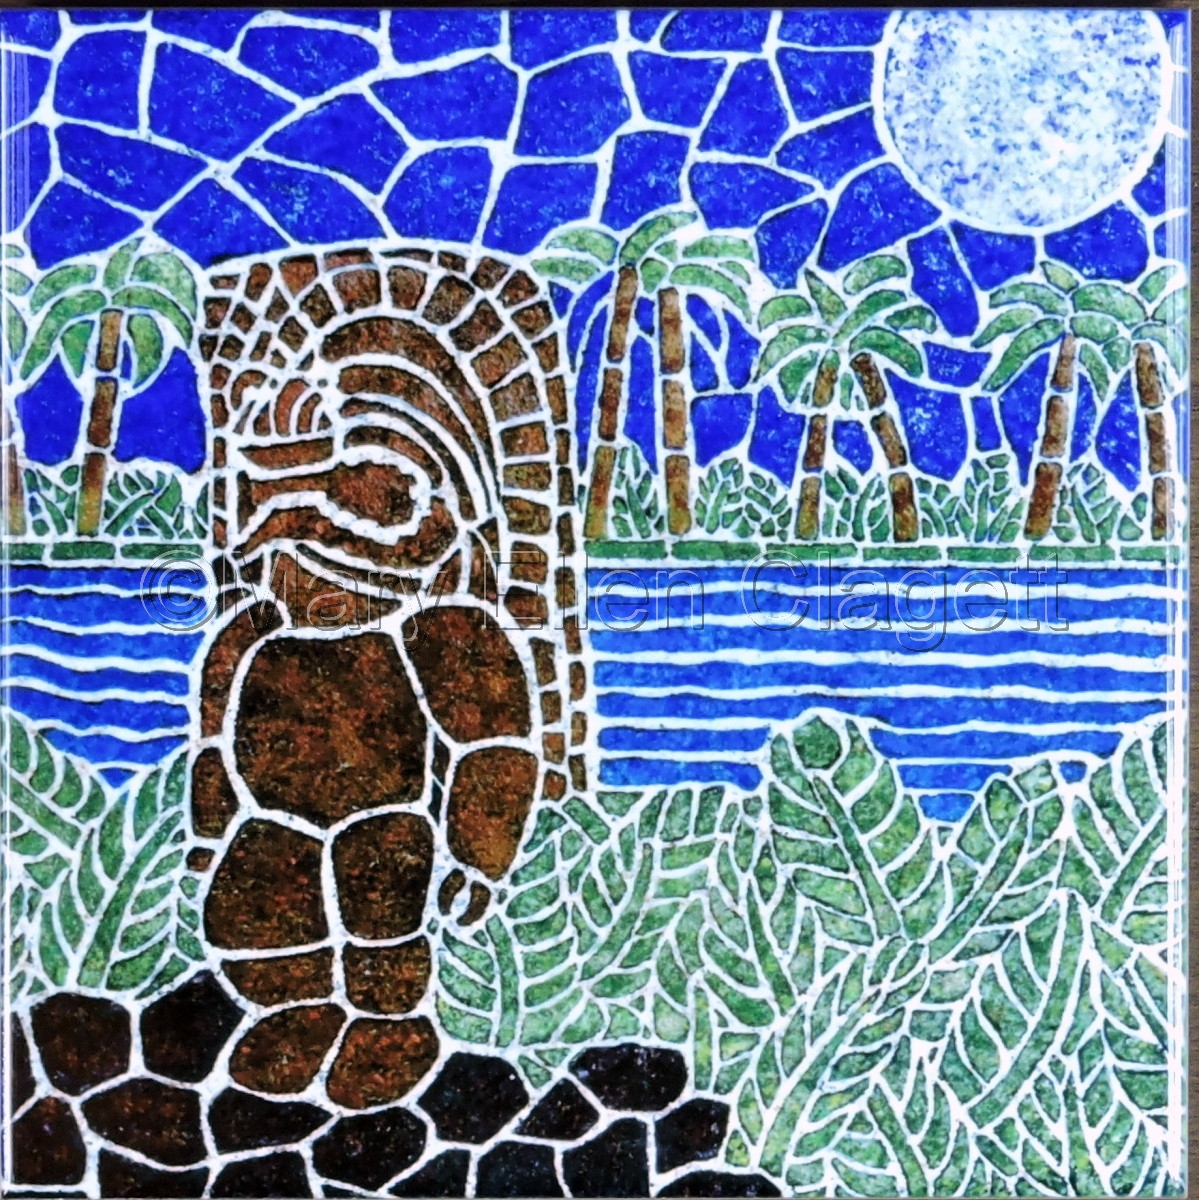 Pu'uhonua (large view)